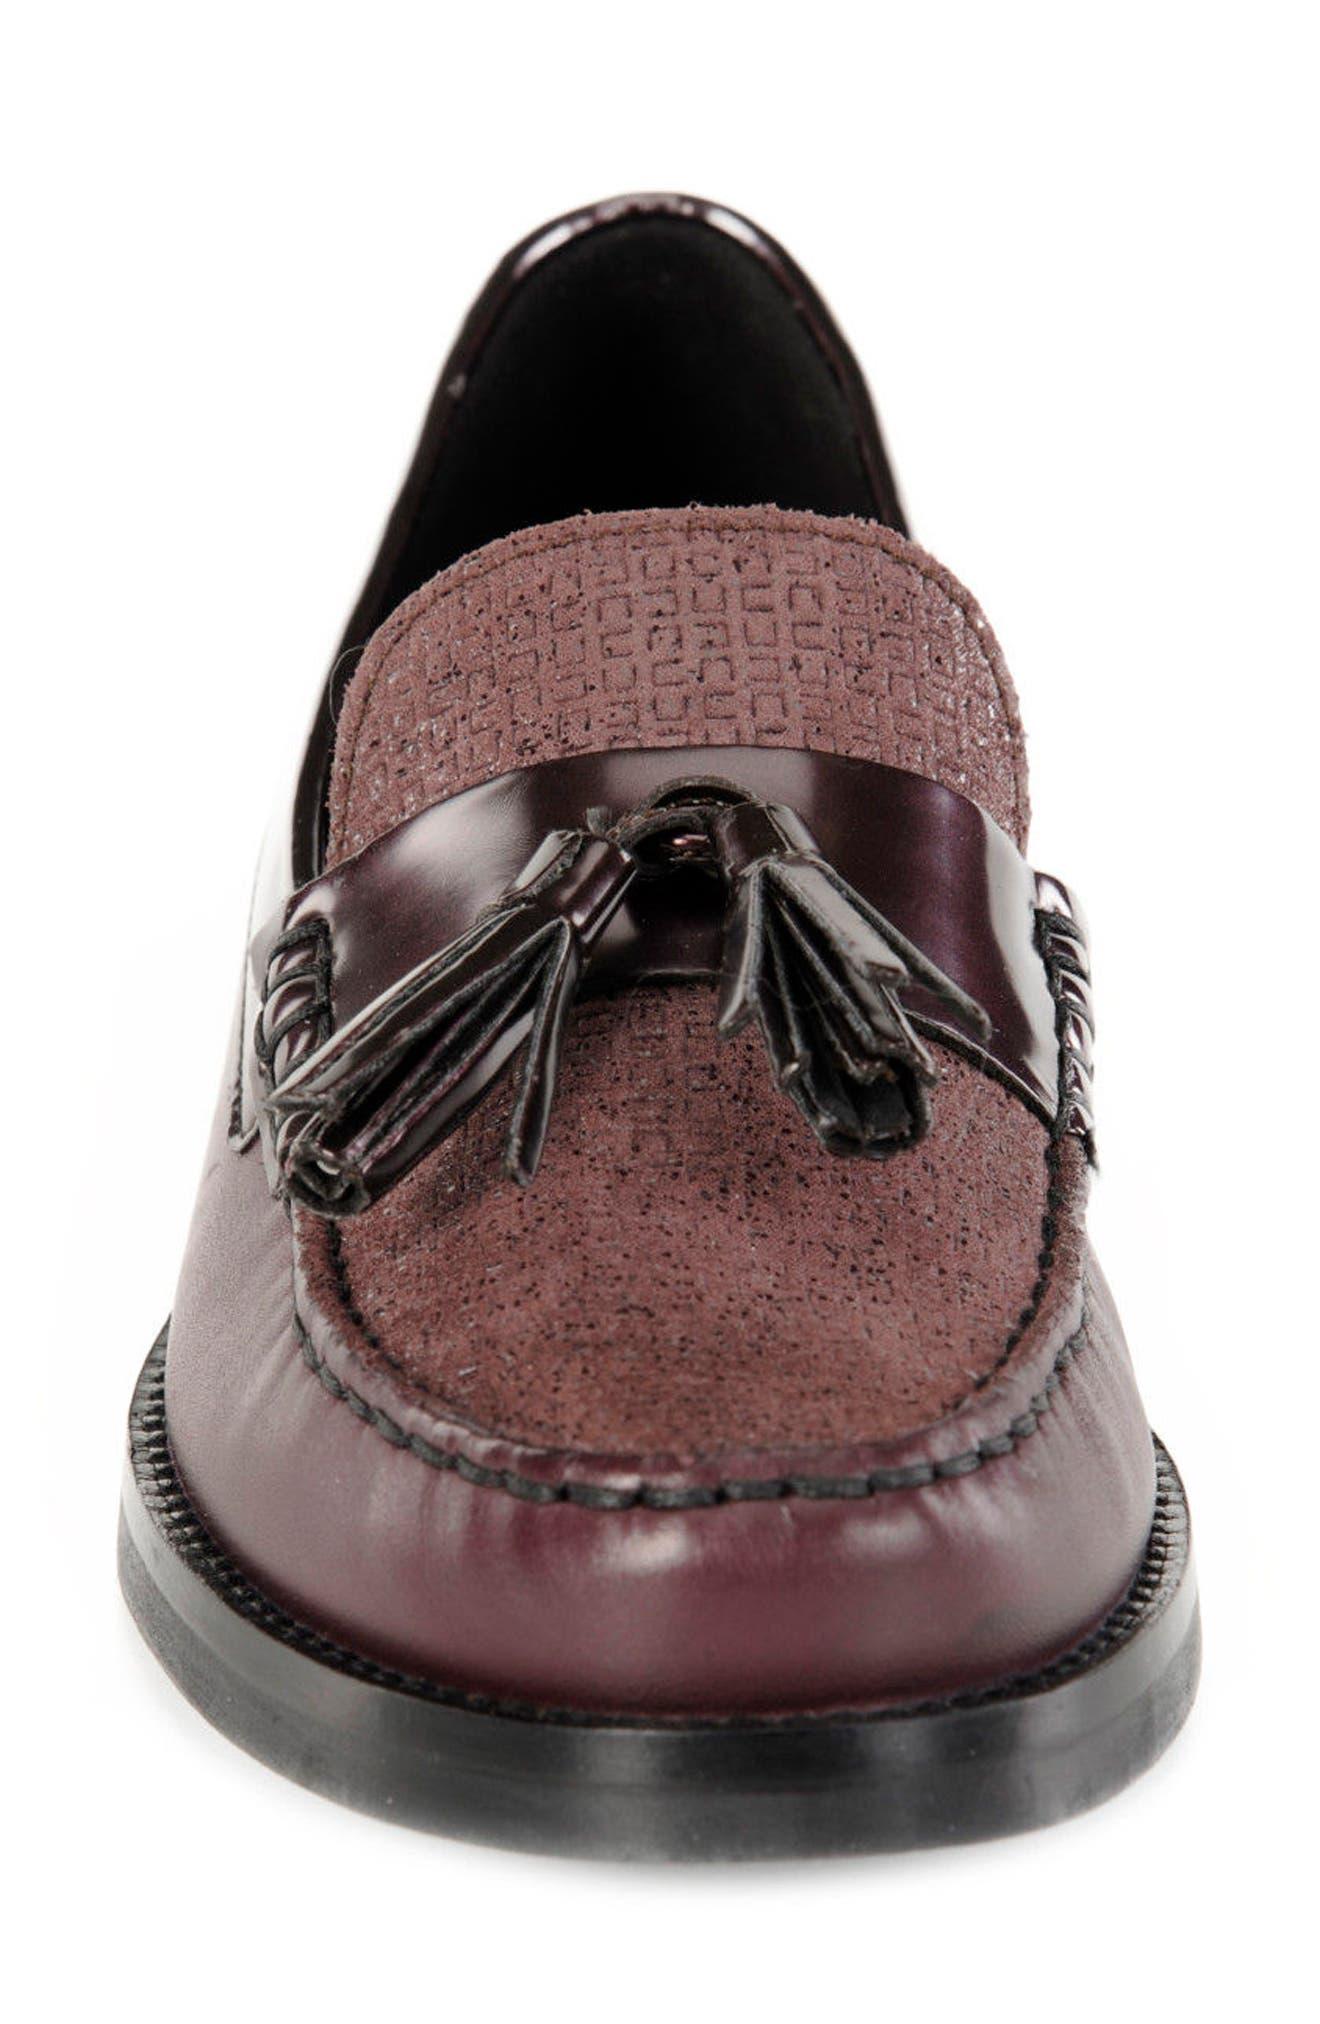 Promethea Loafer,                             Alternate thumbnail 5, color,                             Prune Leather